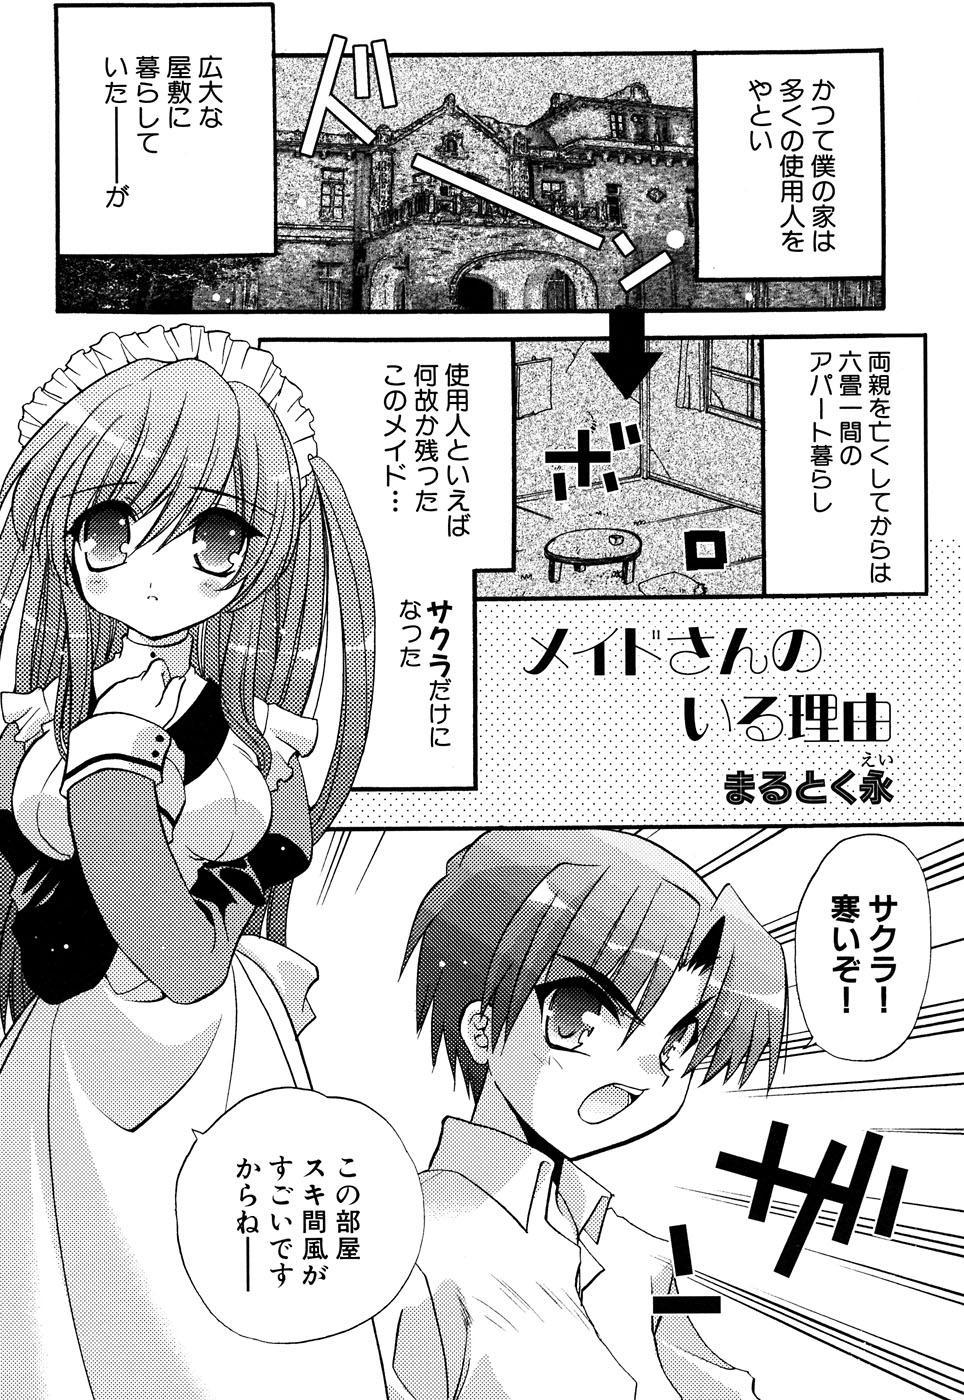 Fechikko VS Series ROUND.2 Miko San VS Maid San 127